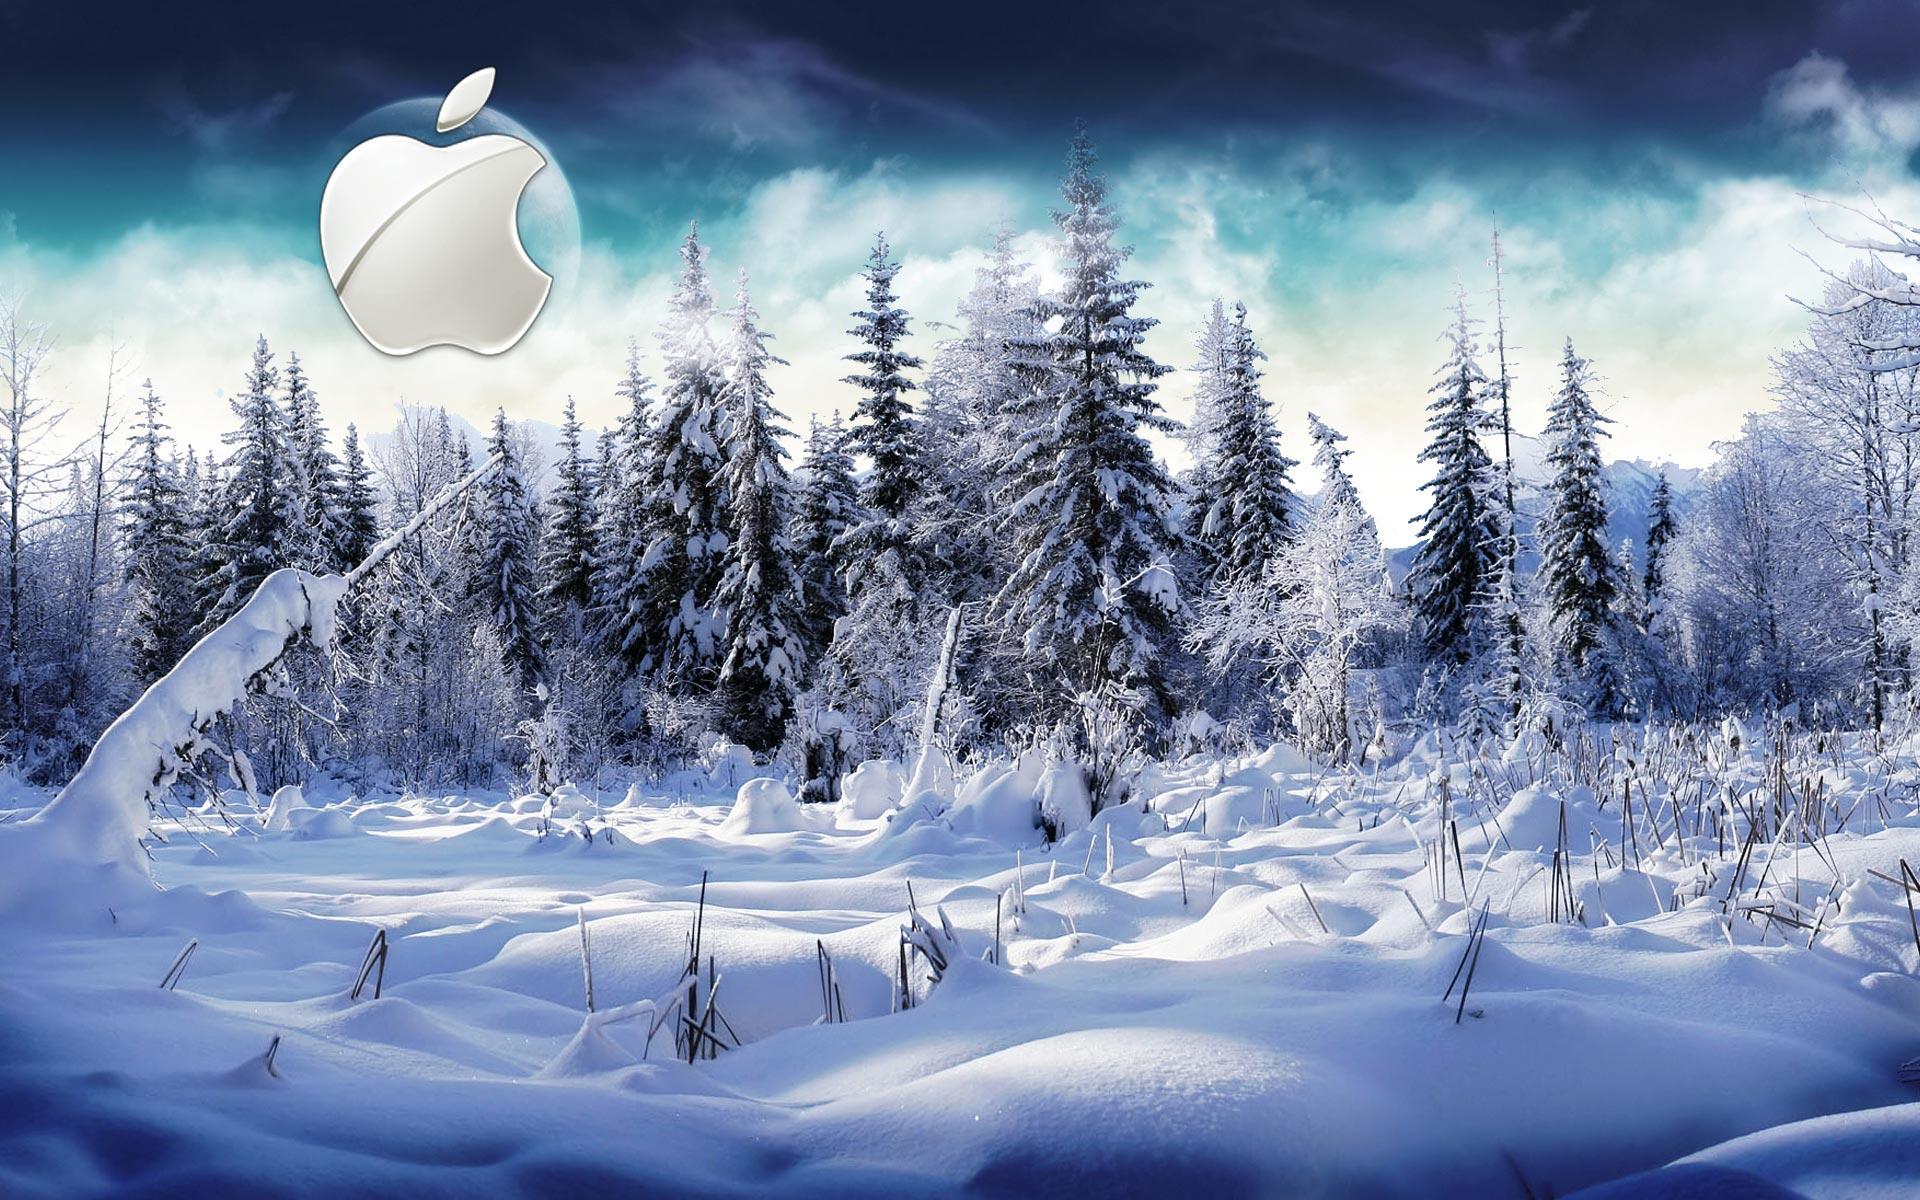 Sfondi hd mac apple inverno e neve sfondi hd gratis for Sfondi hd gratis